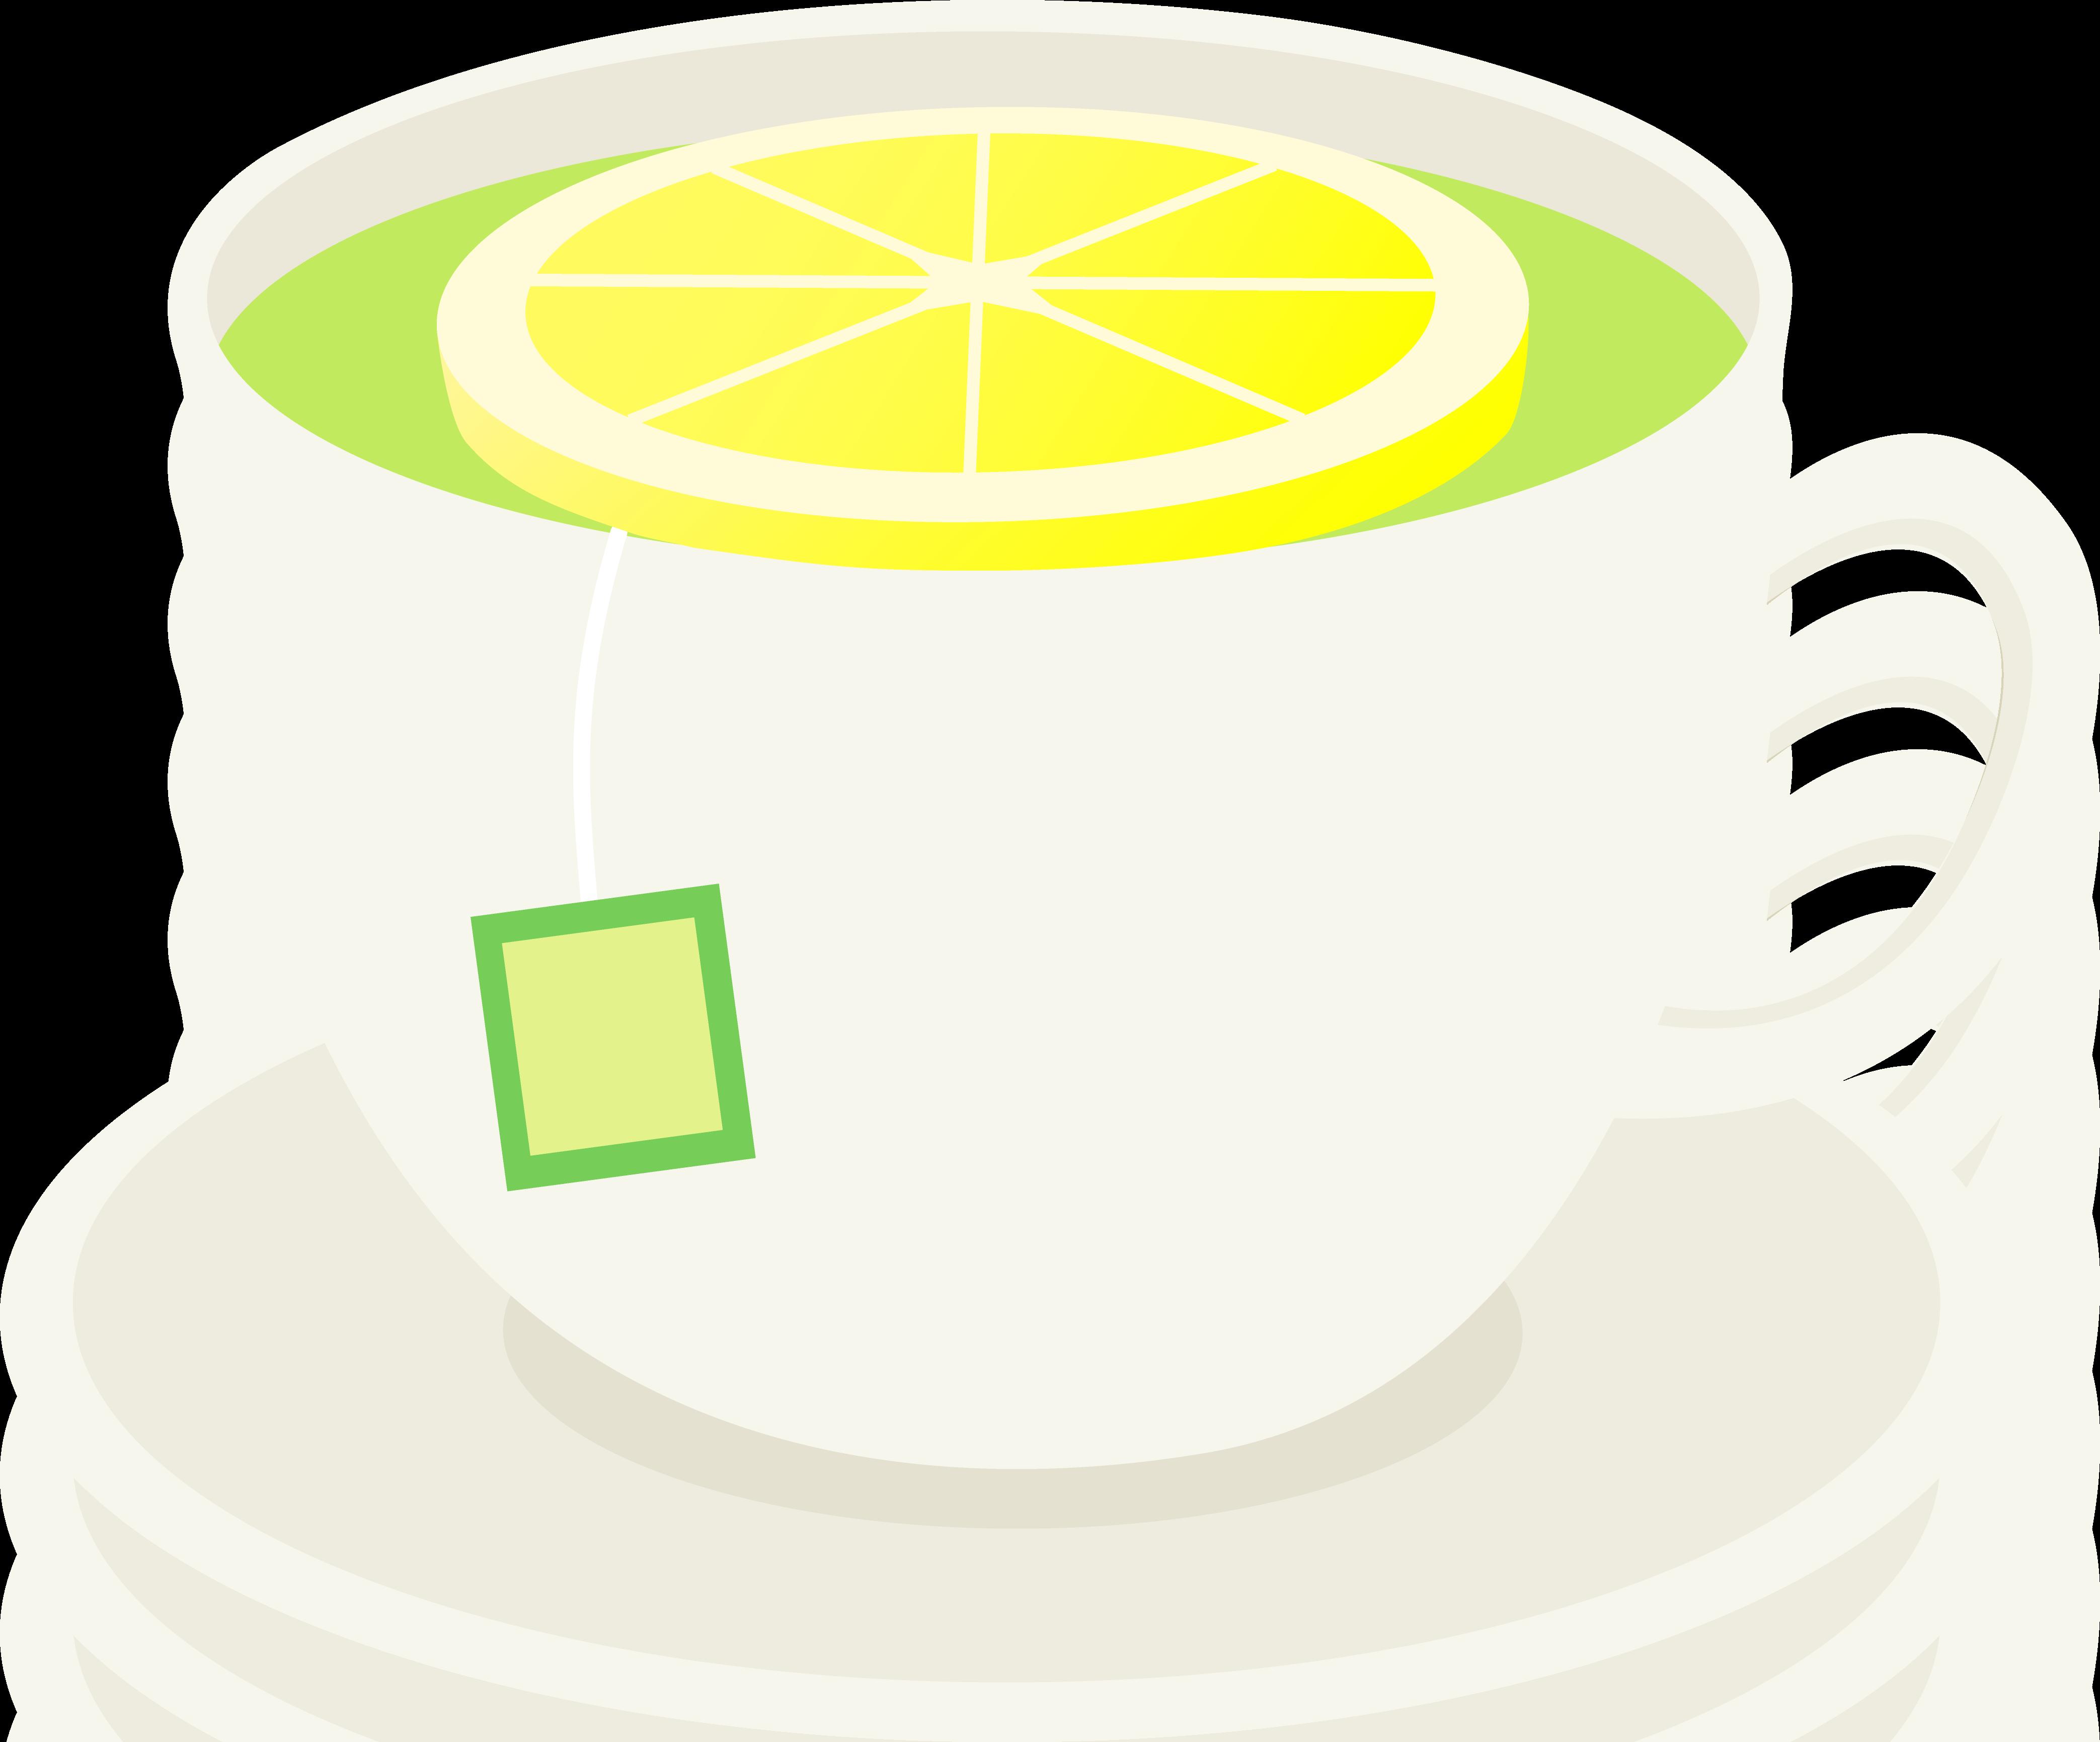 Mug clipart warm water Free of Lemon Lemon Green